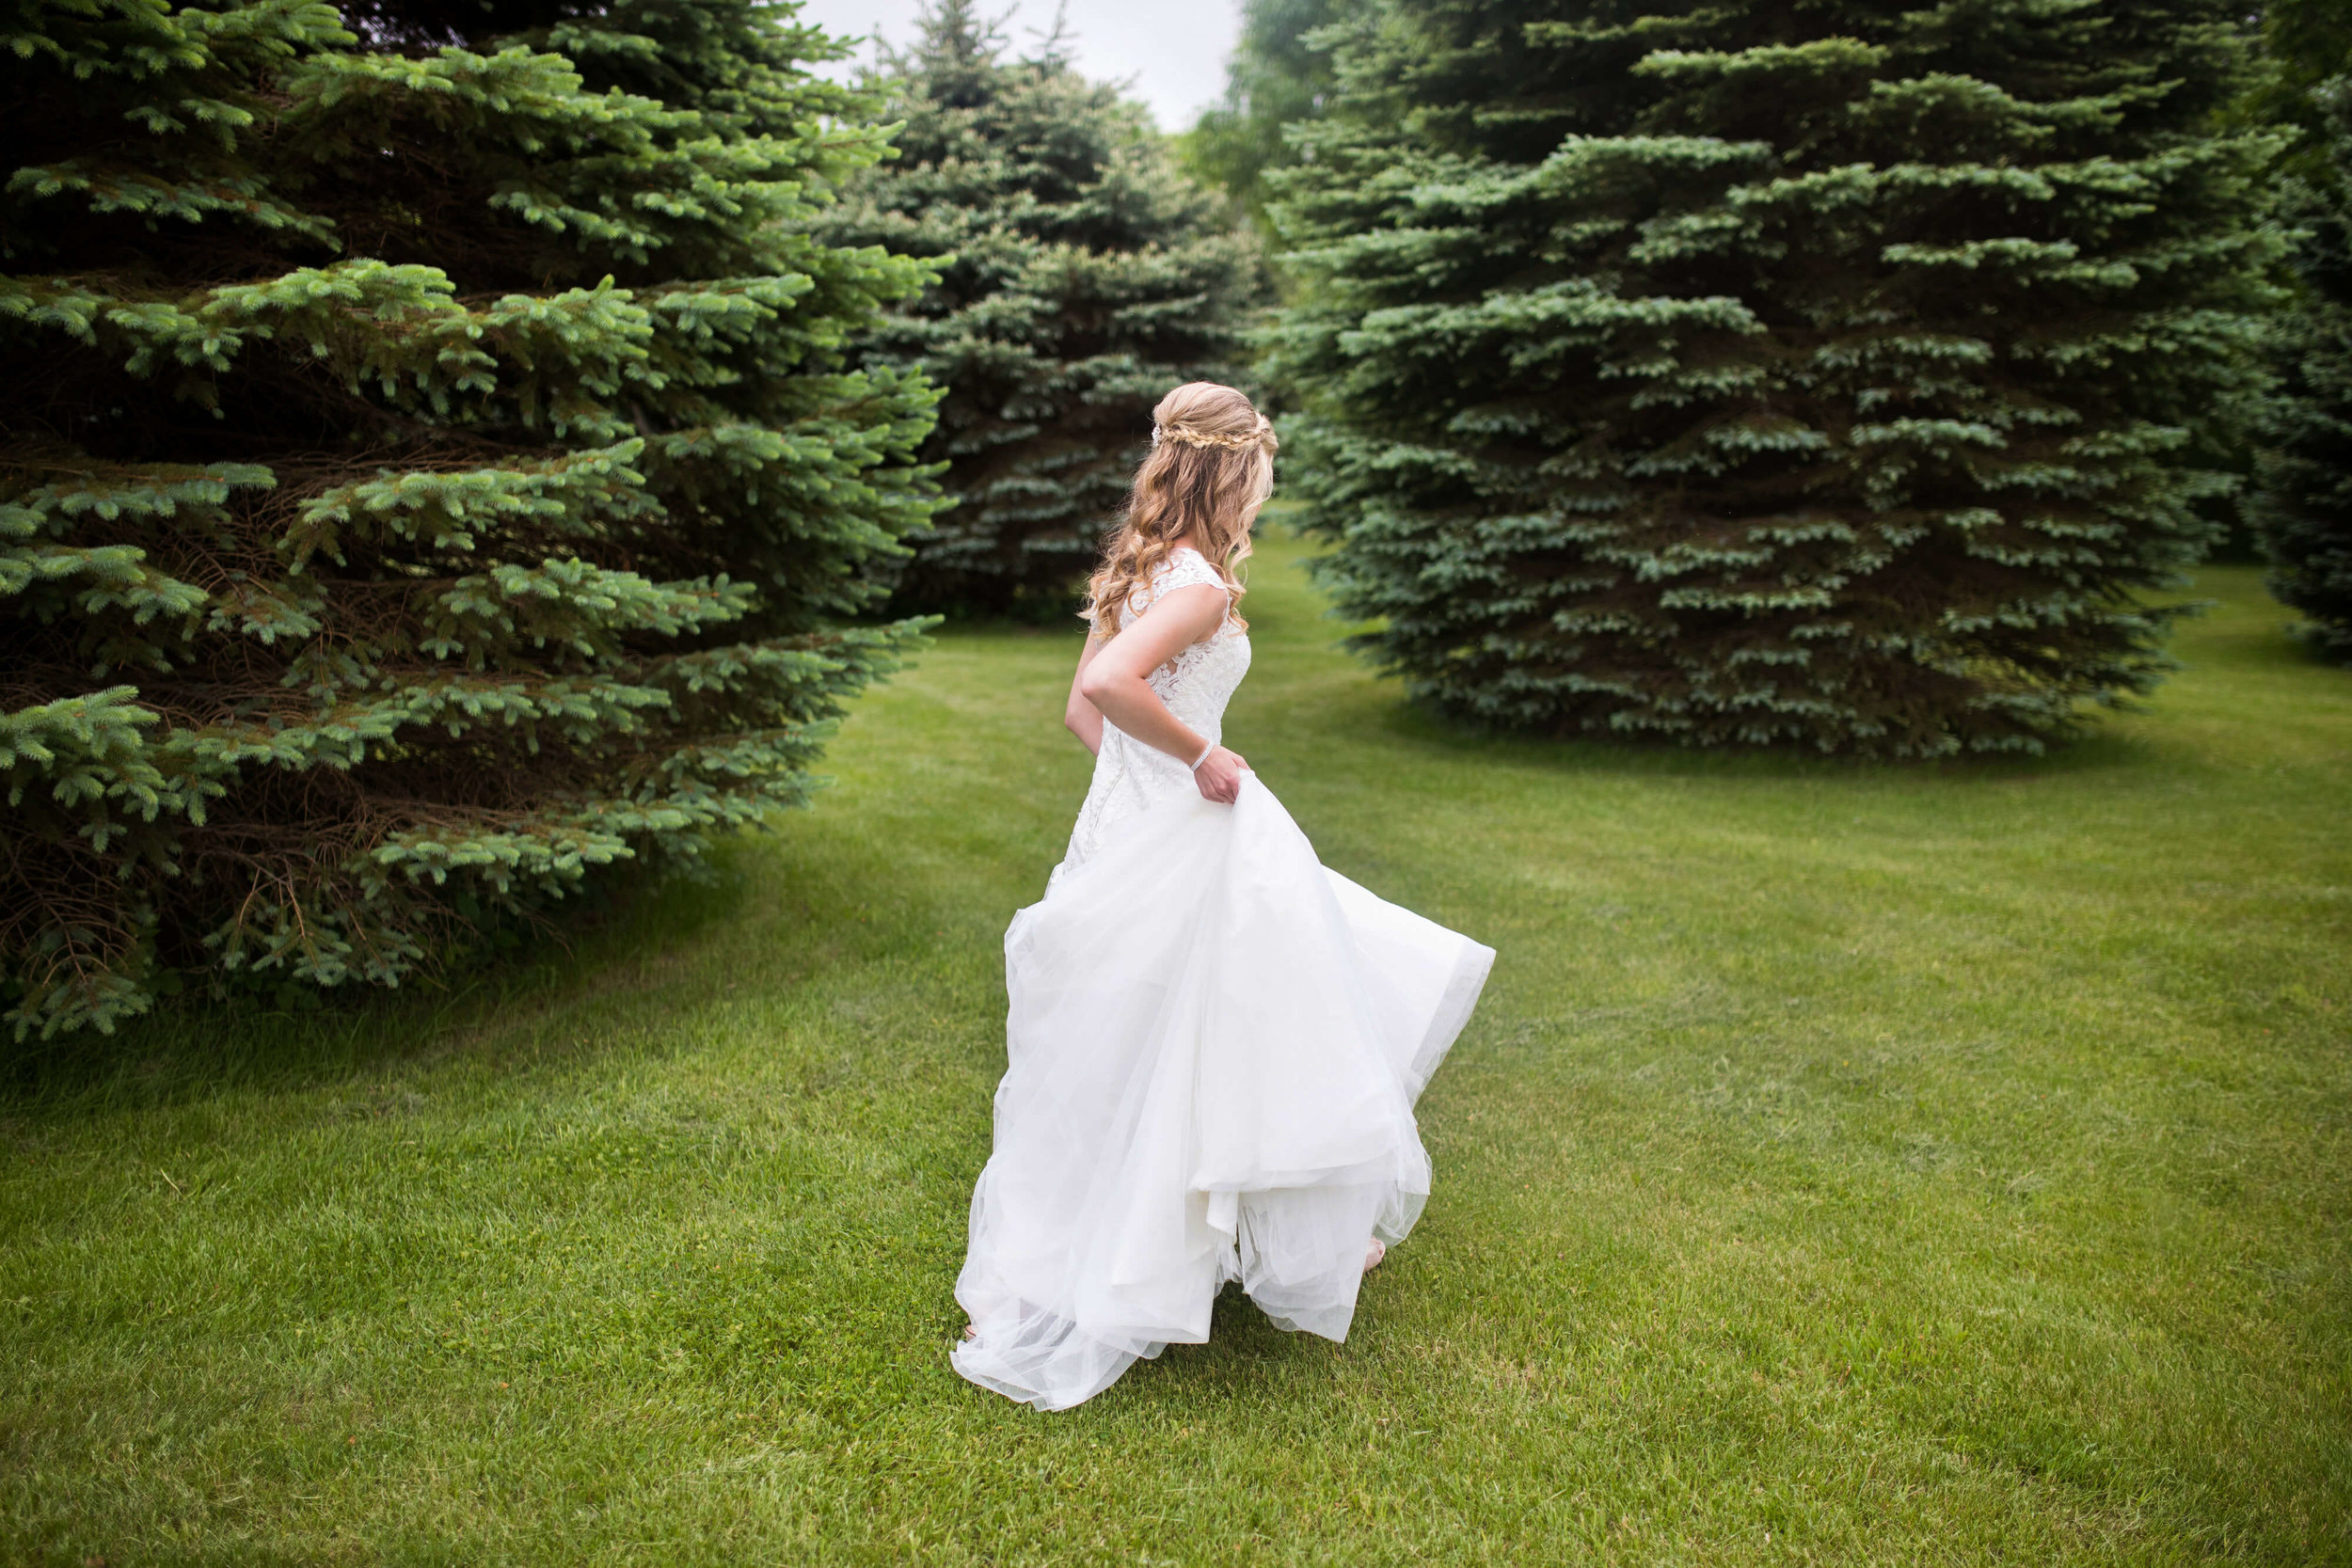 bride walking through the trees | Minnesota wedding photographer Studio KH wedding dress details | wedding blog | Sixpence Events 70 Ways to Photograph Your Wedding Dress.jpg